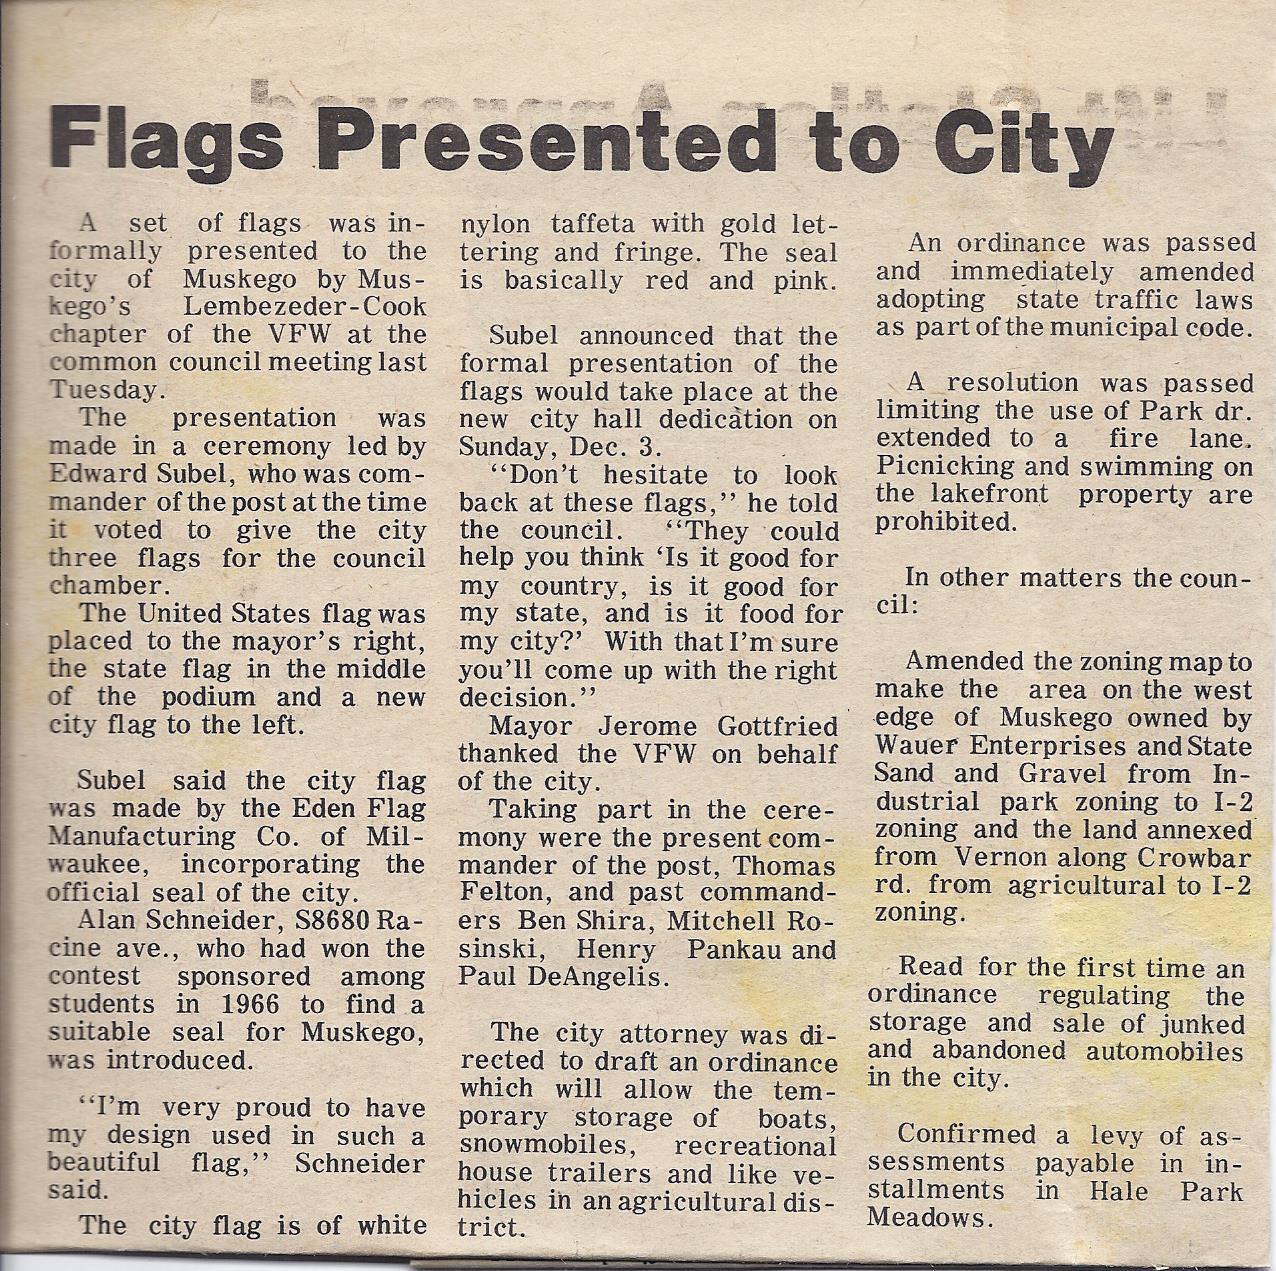 City council meeting essay